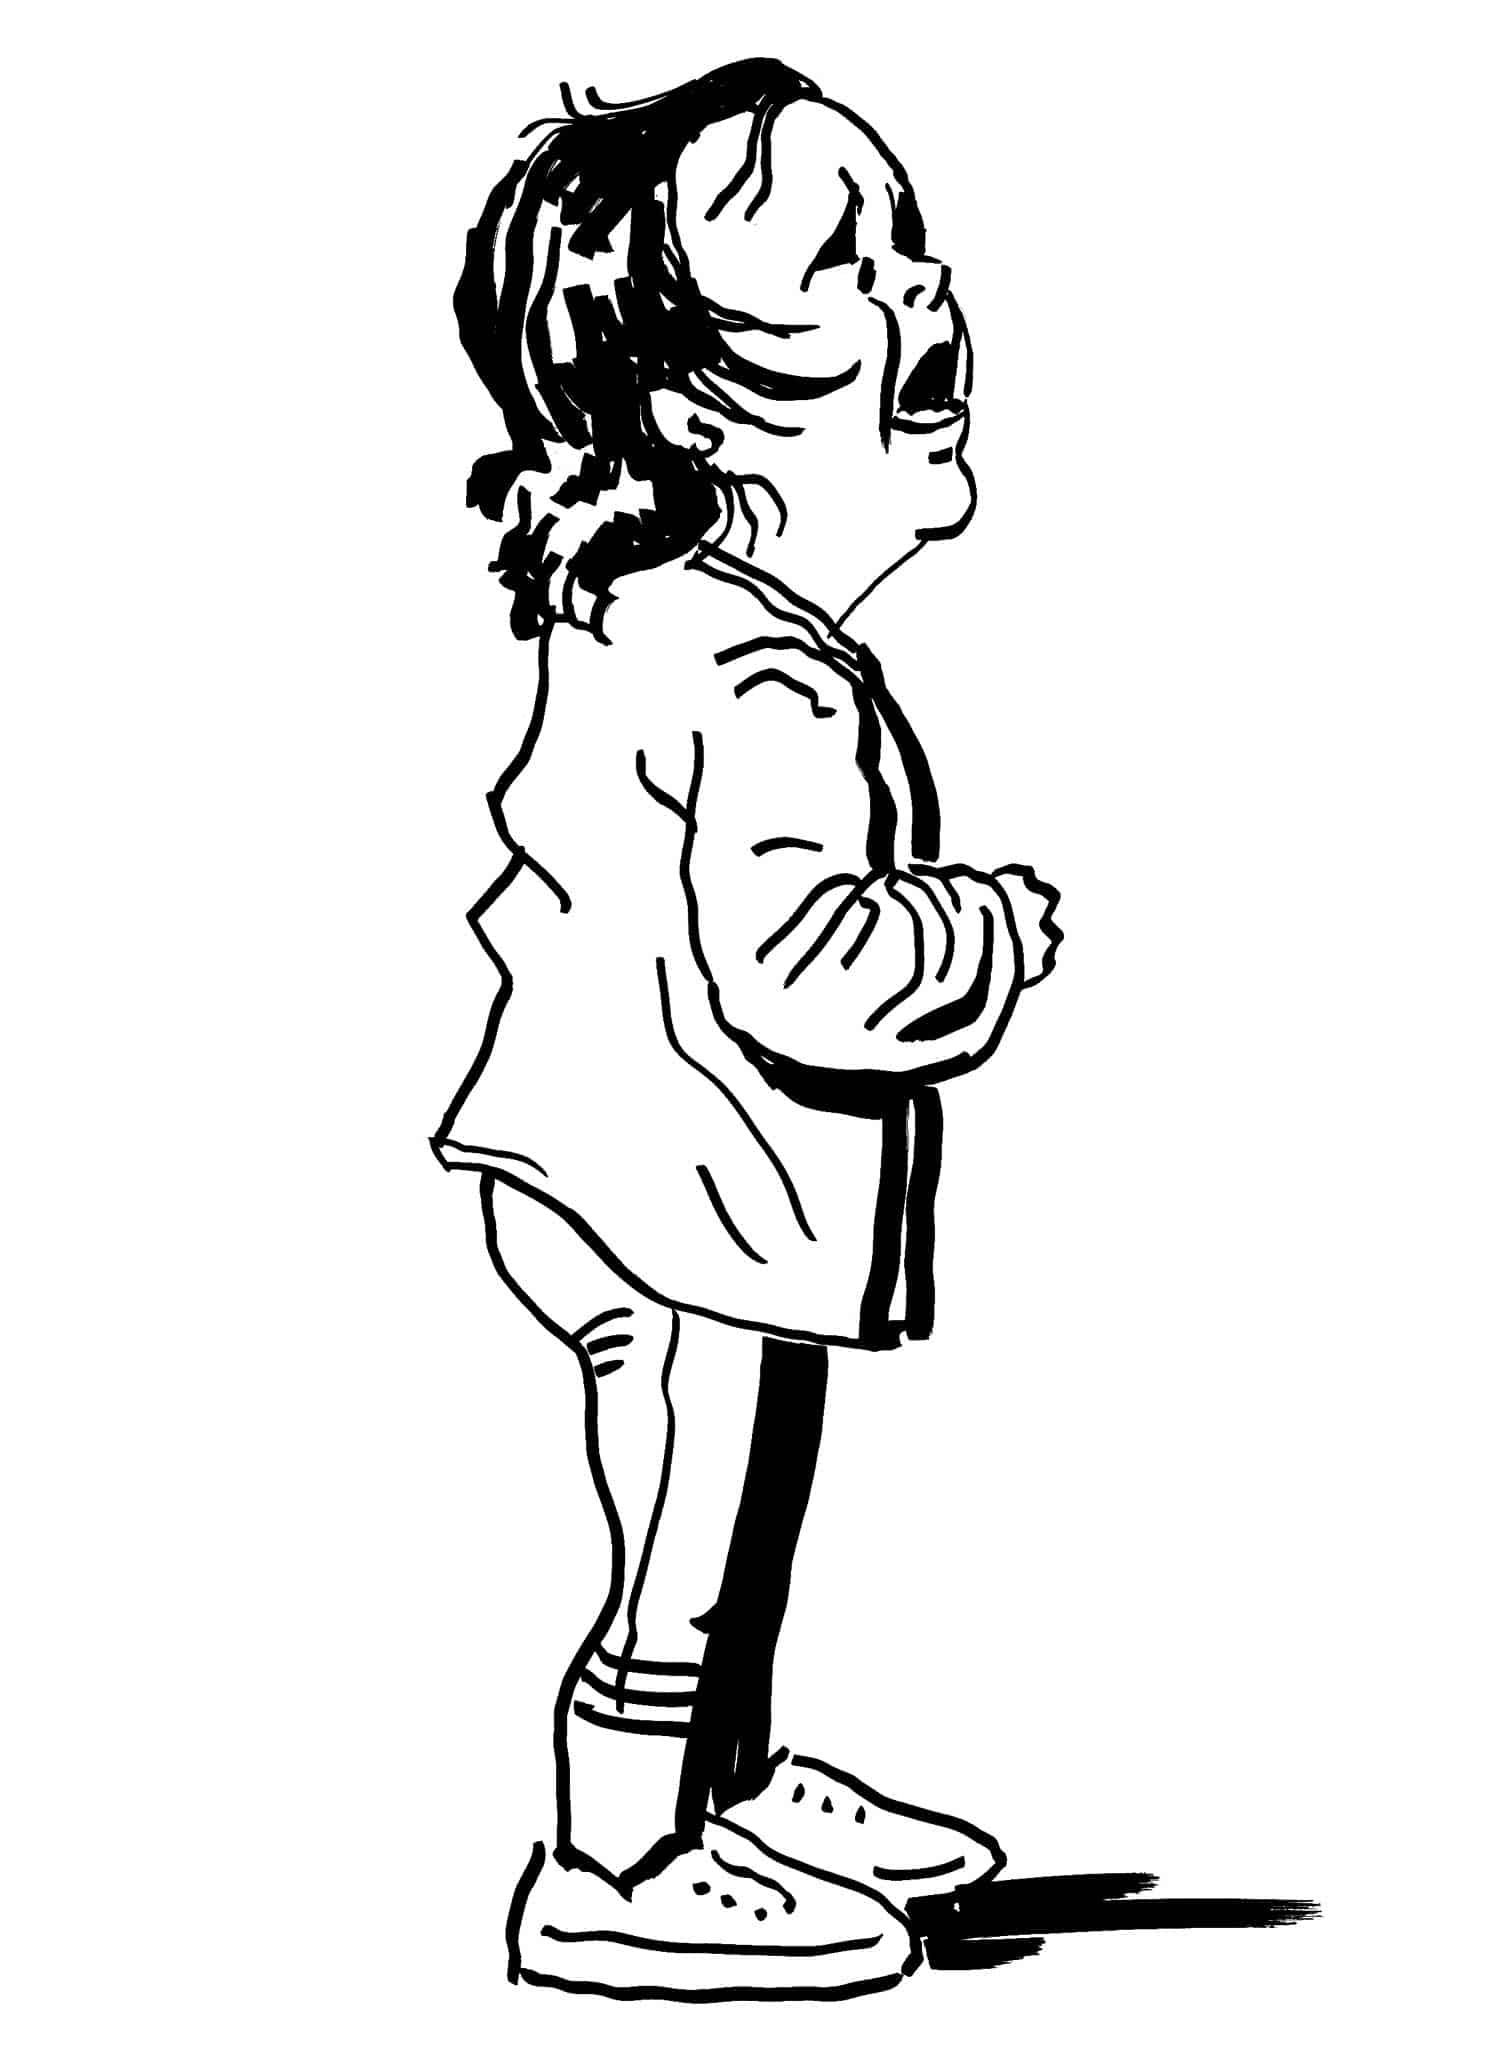 KH3821-immigrant-border-child-crying